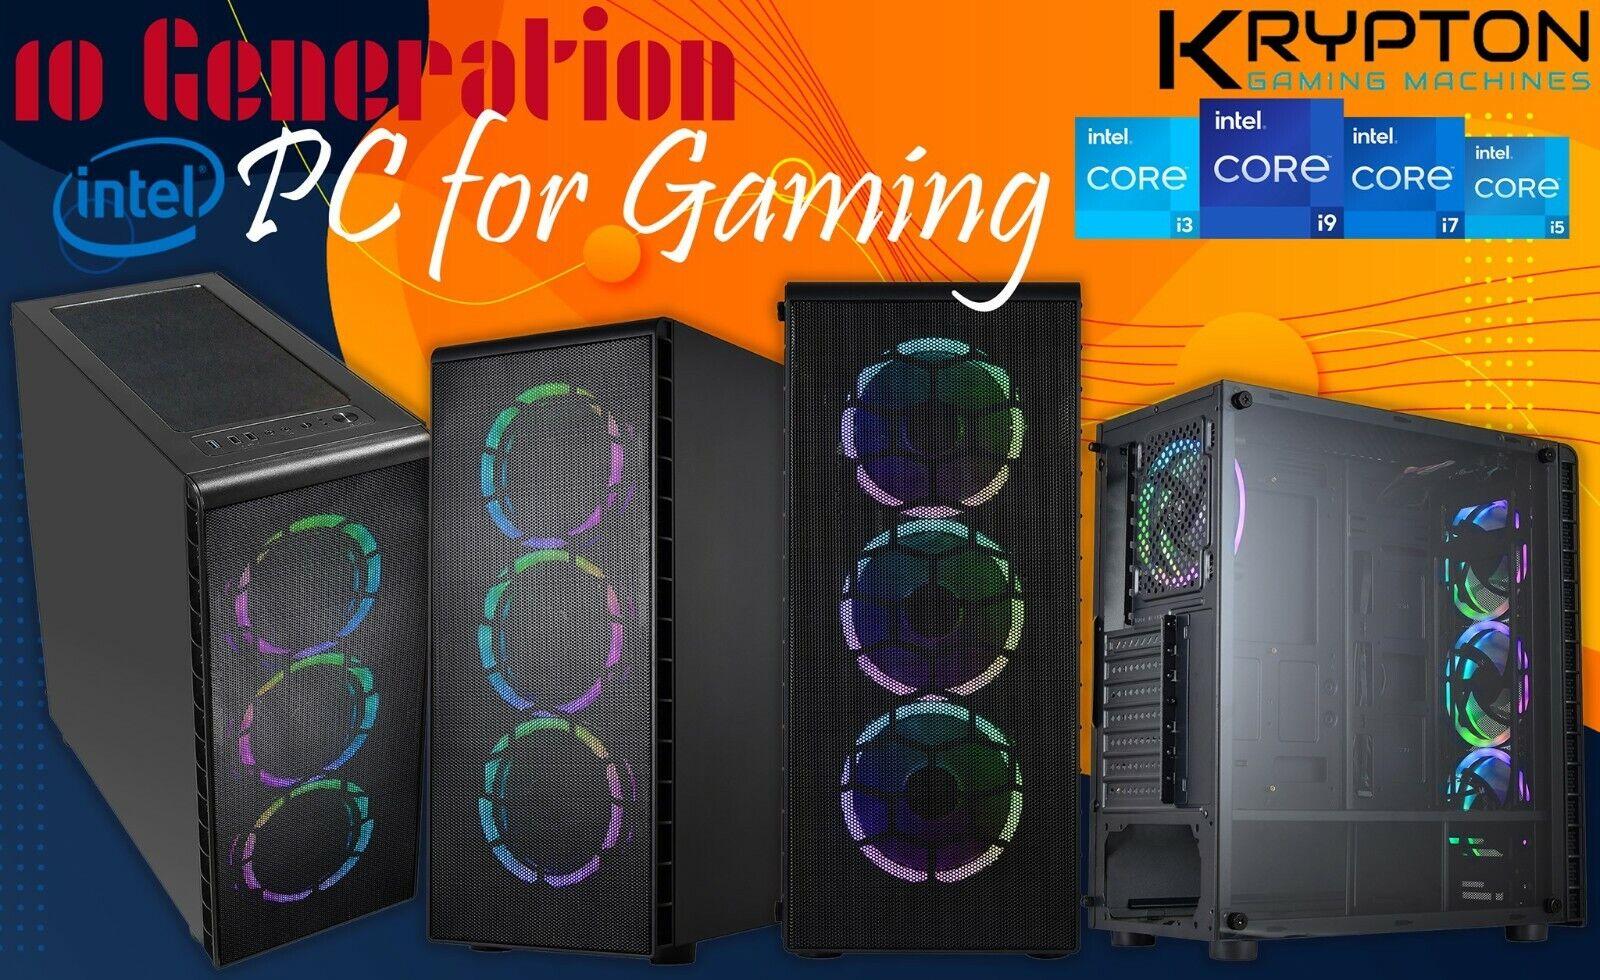 Computer Games - Gaming PC Computer Intel i7 11700 2TB HDD 480GB SSD 32GB RAM 6GB GTX1660-Air